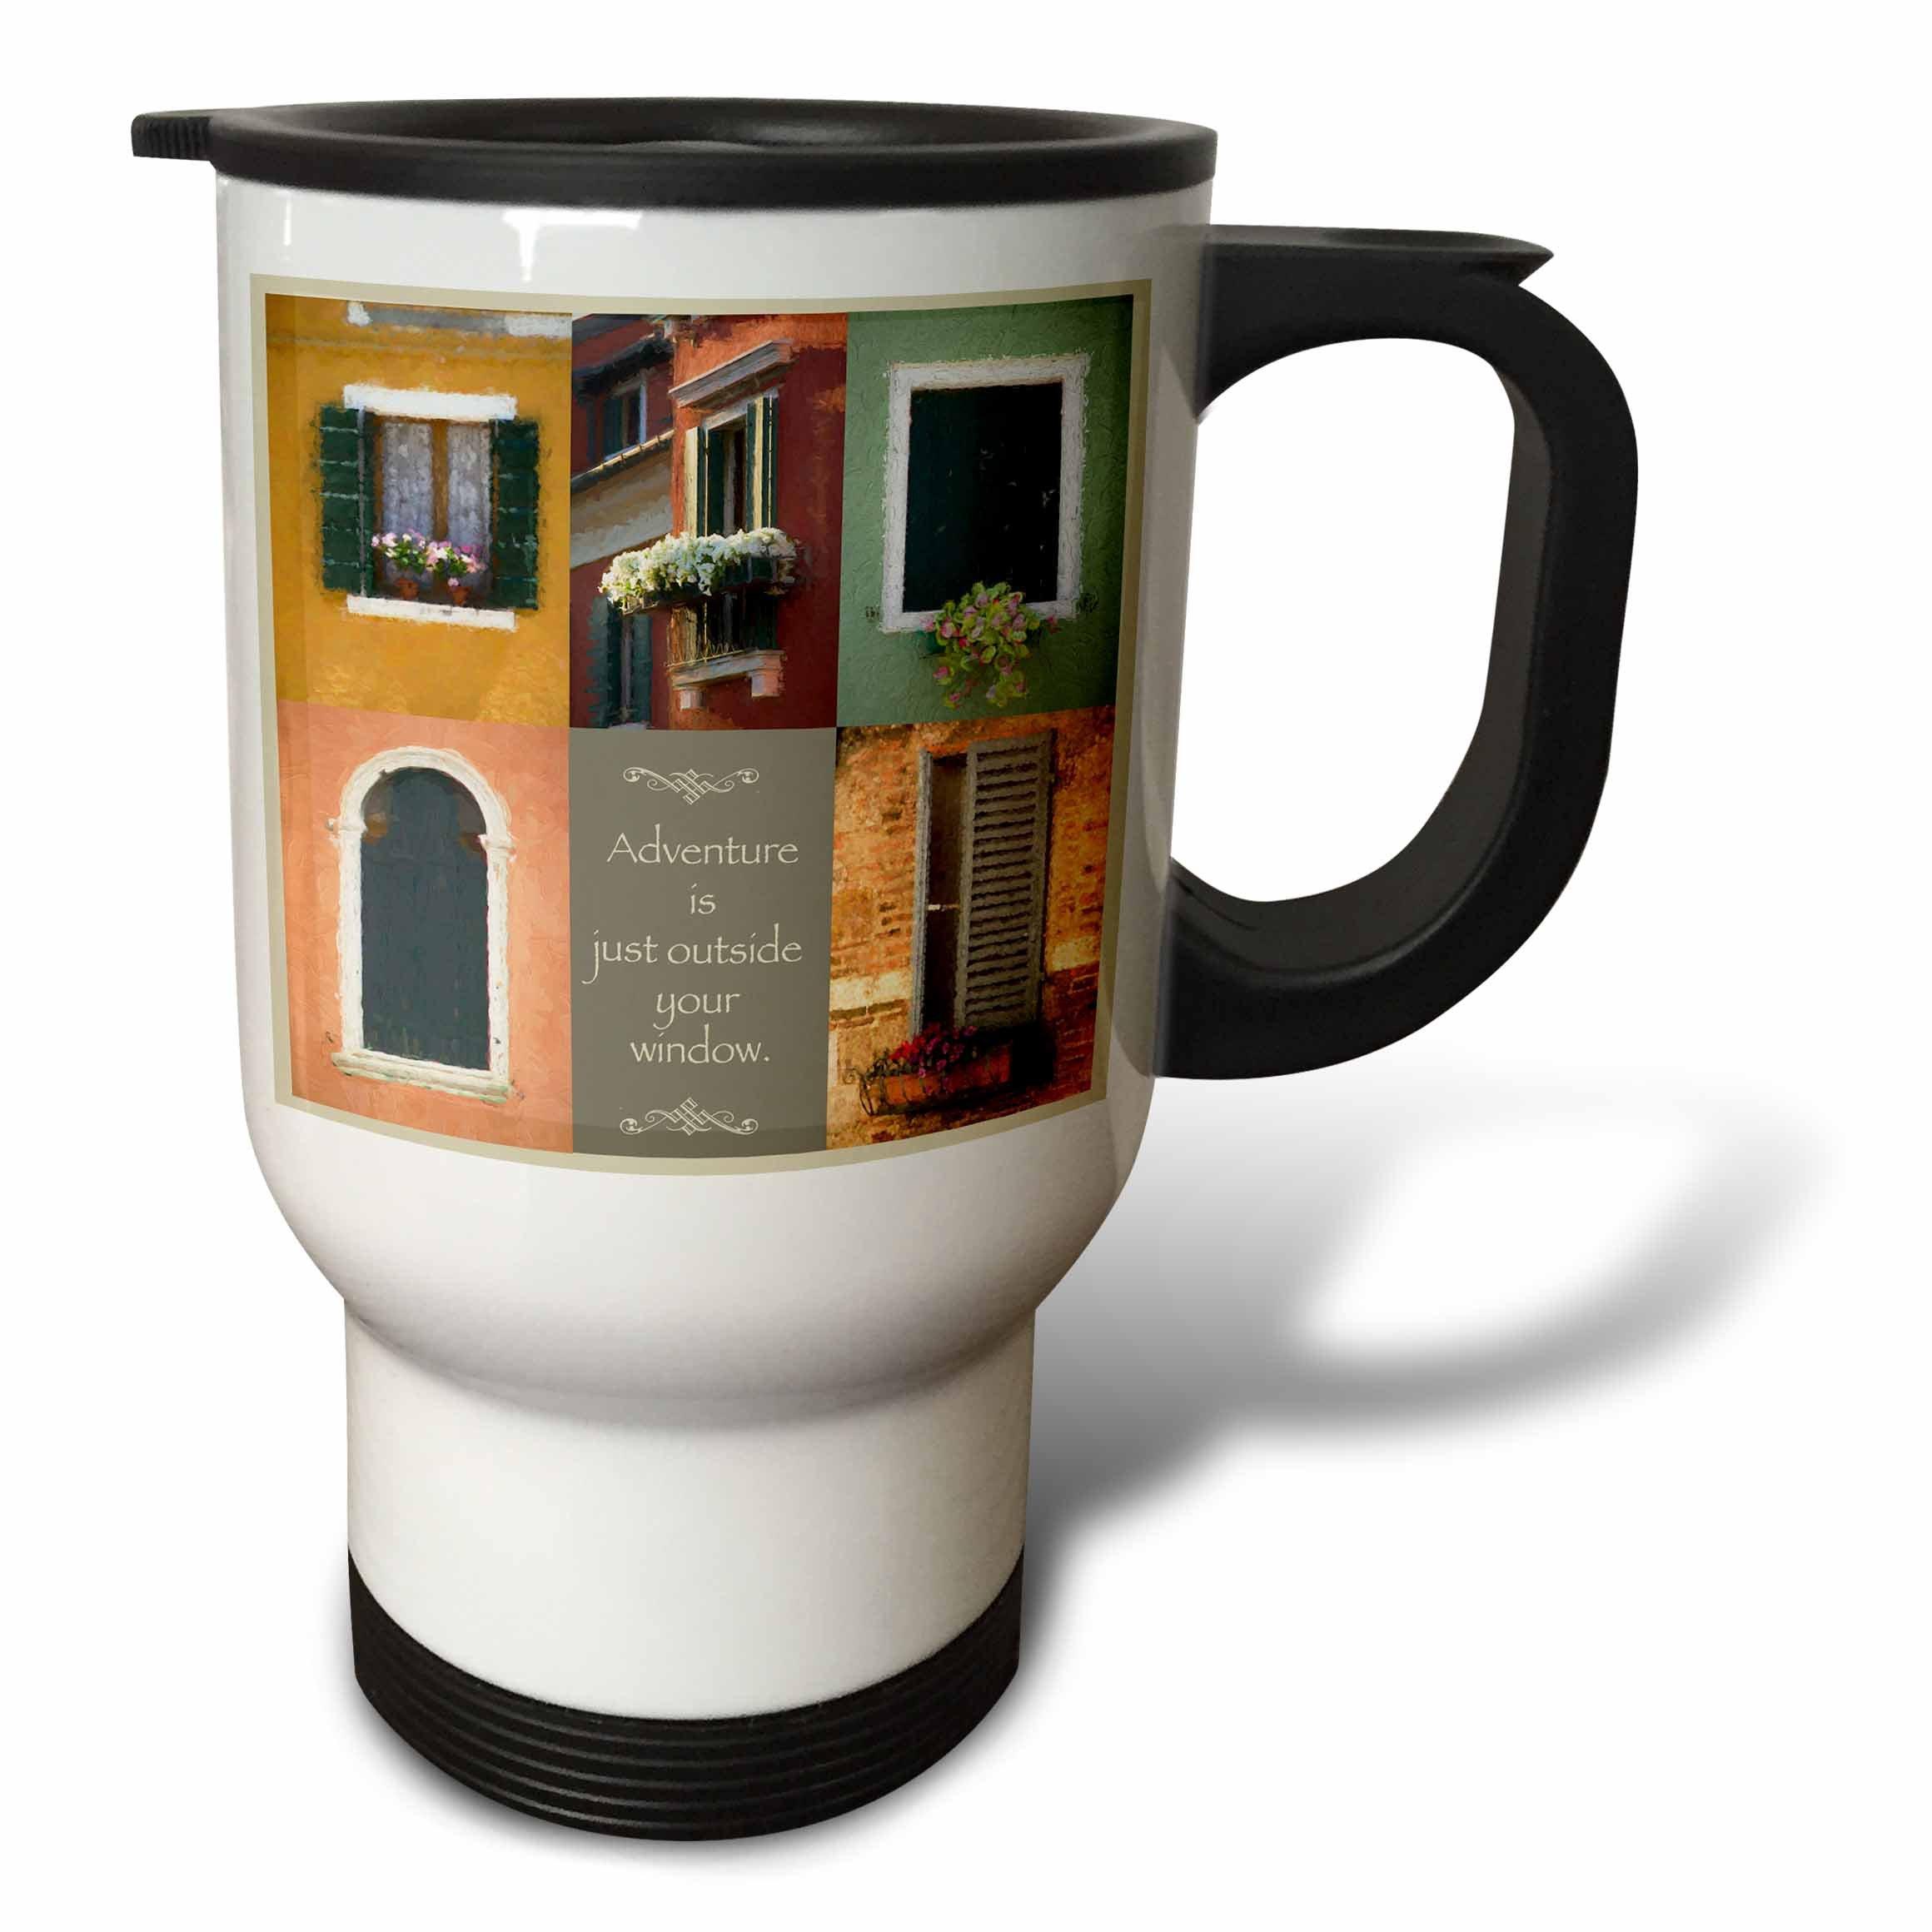 3dRose Susan Kjellsen Photography - Windows - Antique windows - 14oz Stainless Steel Travel Mug (tm_280229_1)